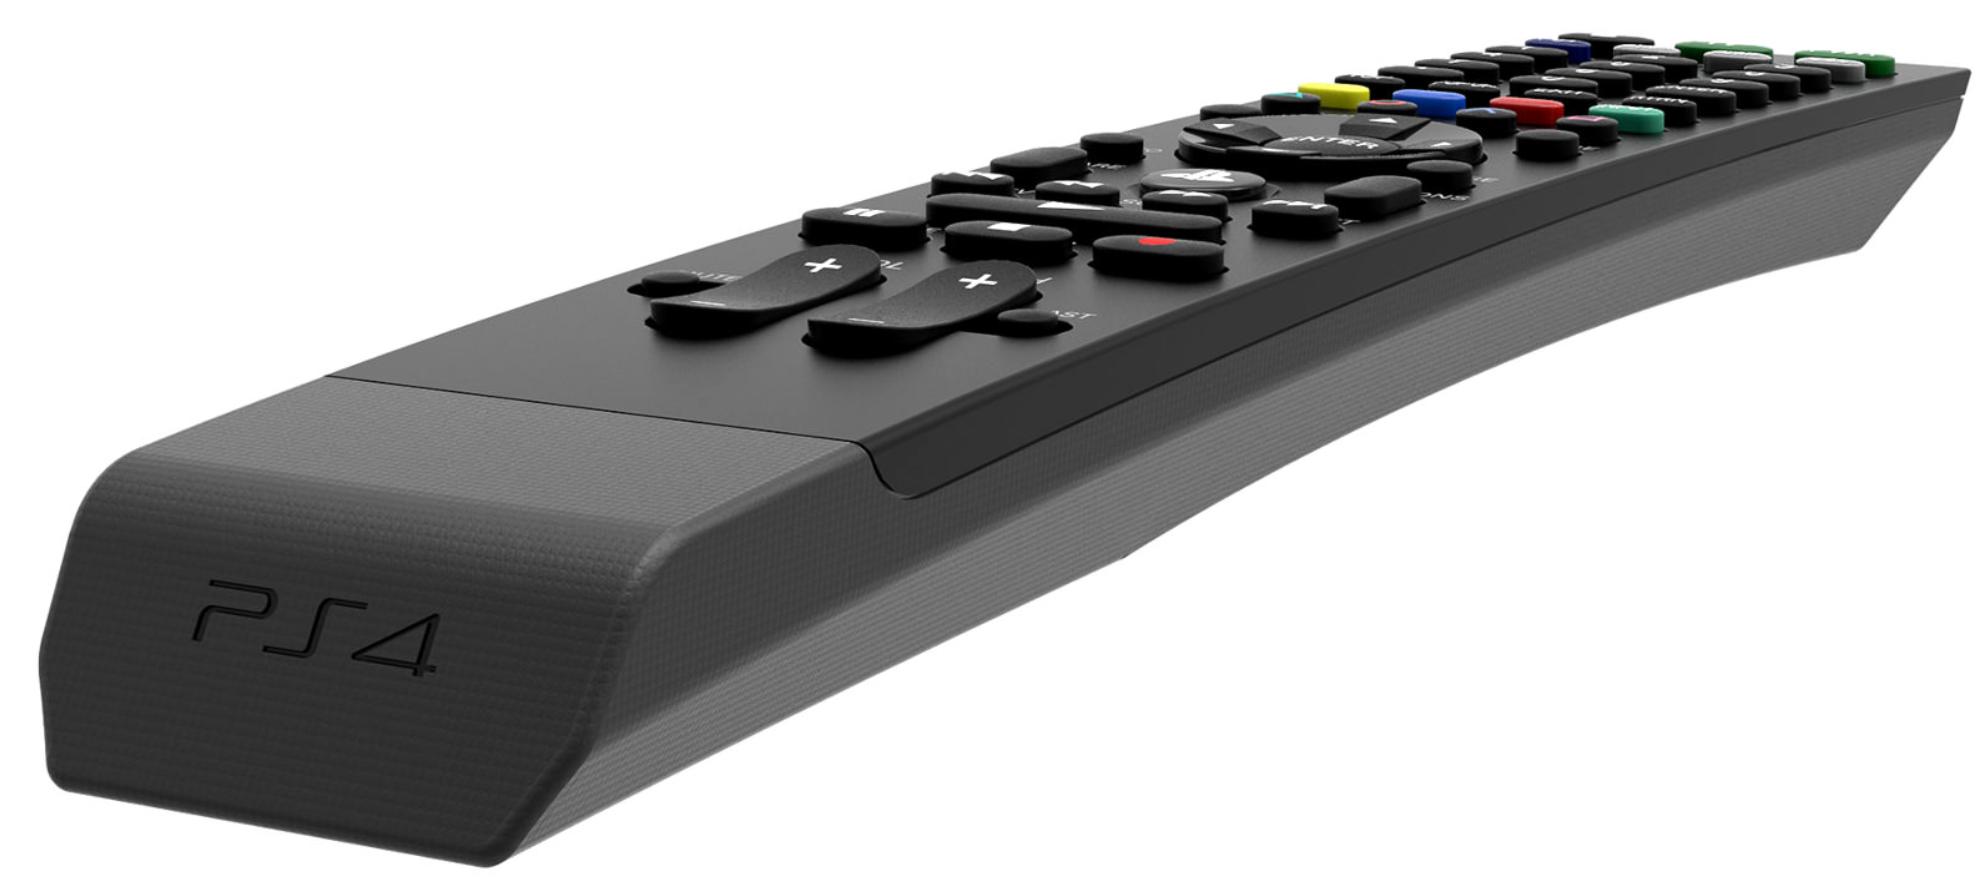 A New PS4 Remote Makes The Playstation A Halfway Decent Set-Top Box